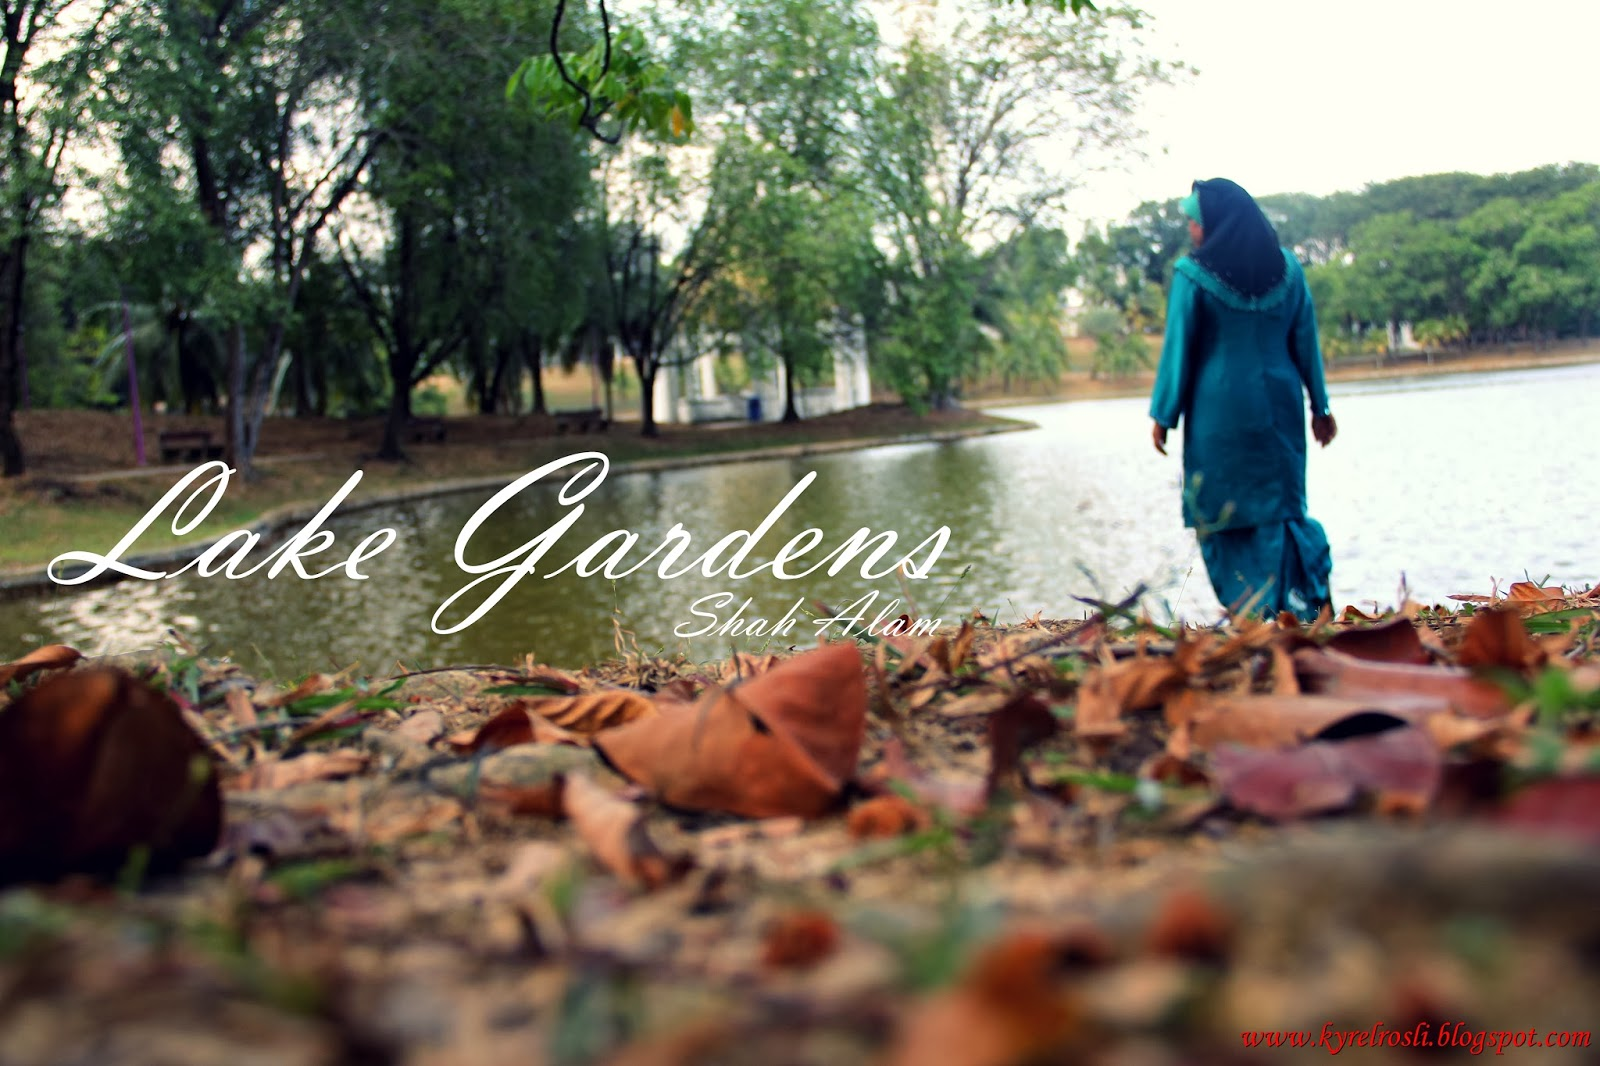 Lake Gardens, Shah Alam